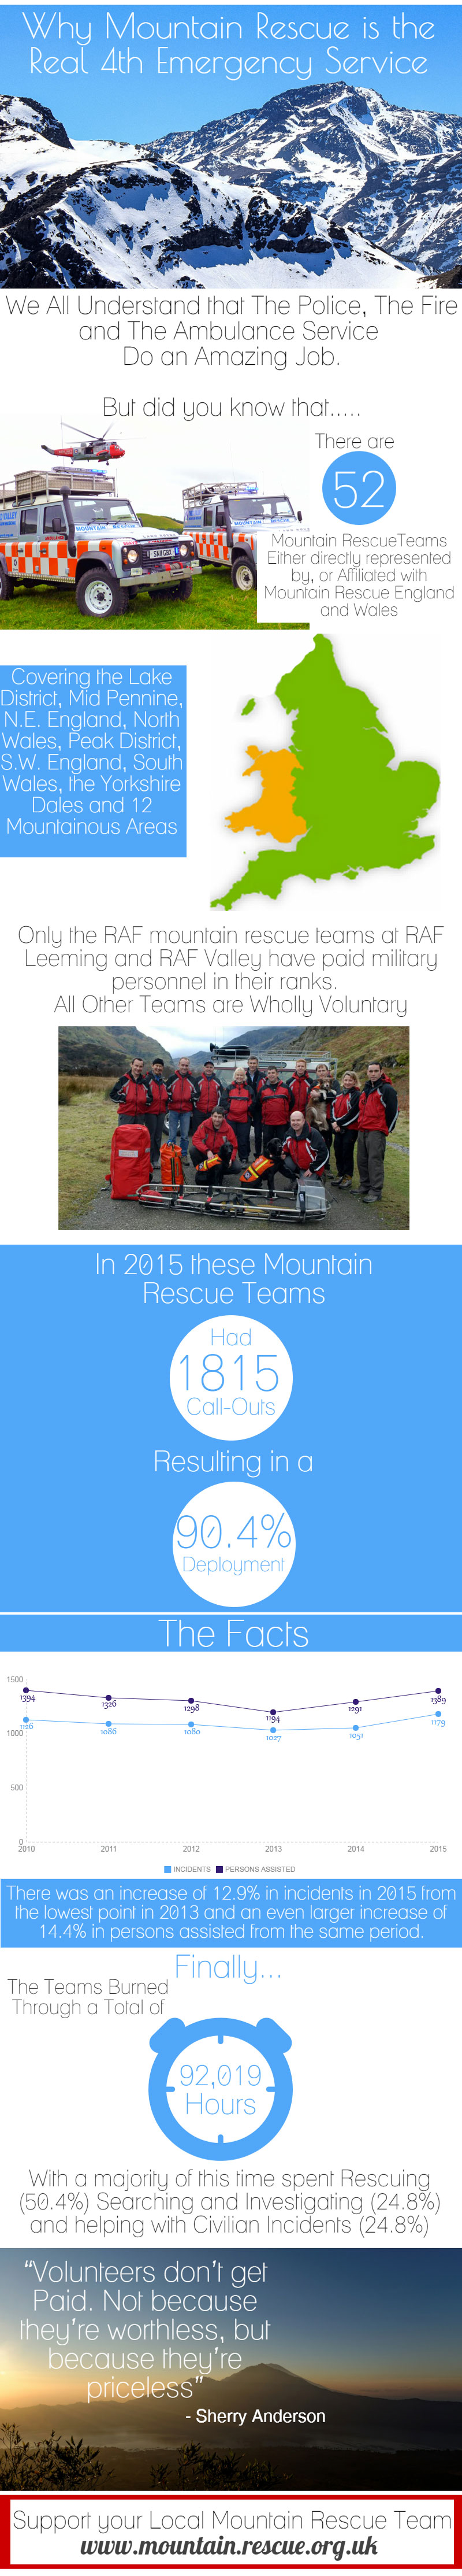 Mountain rescue infographic